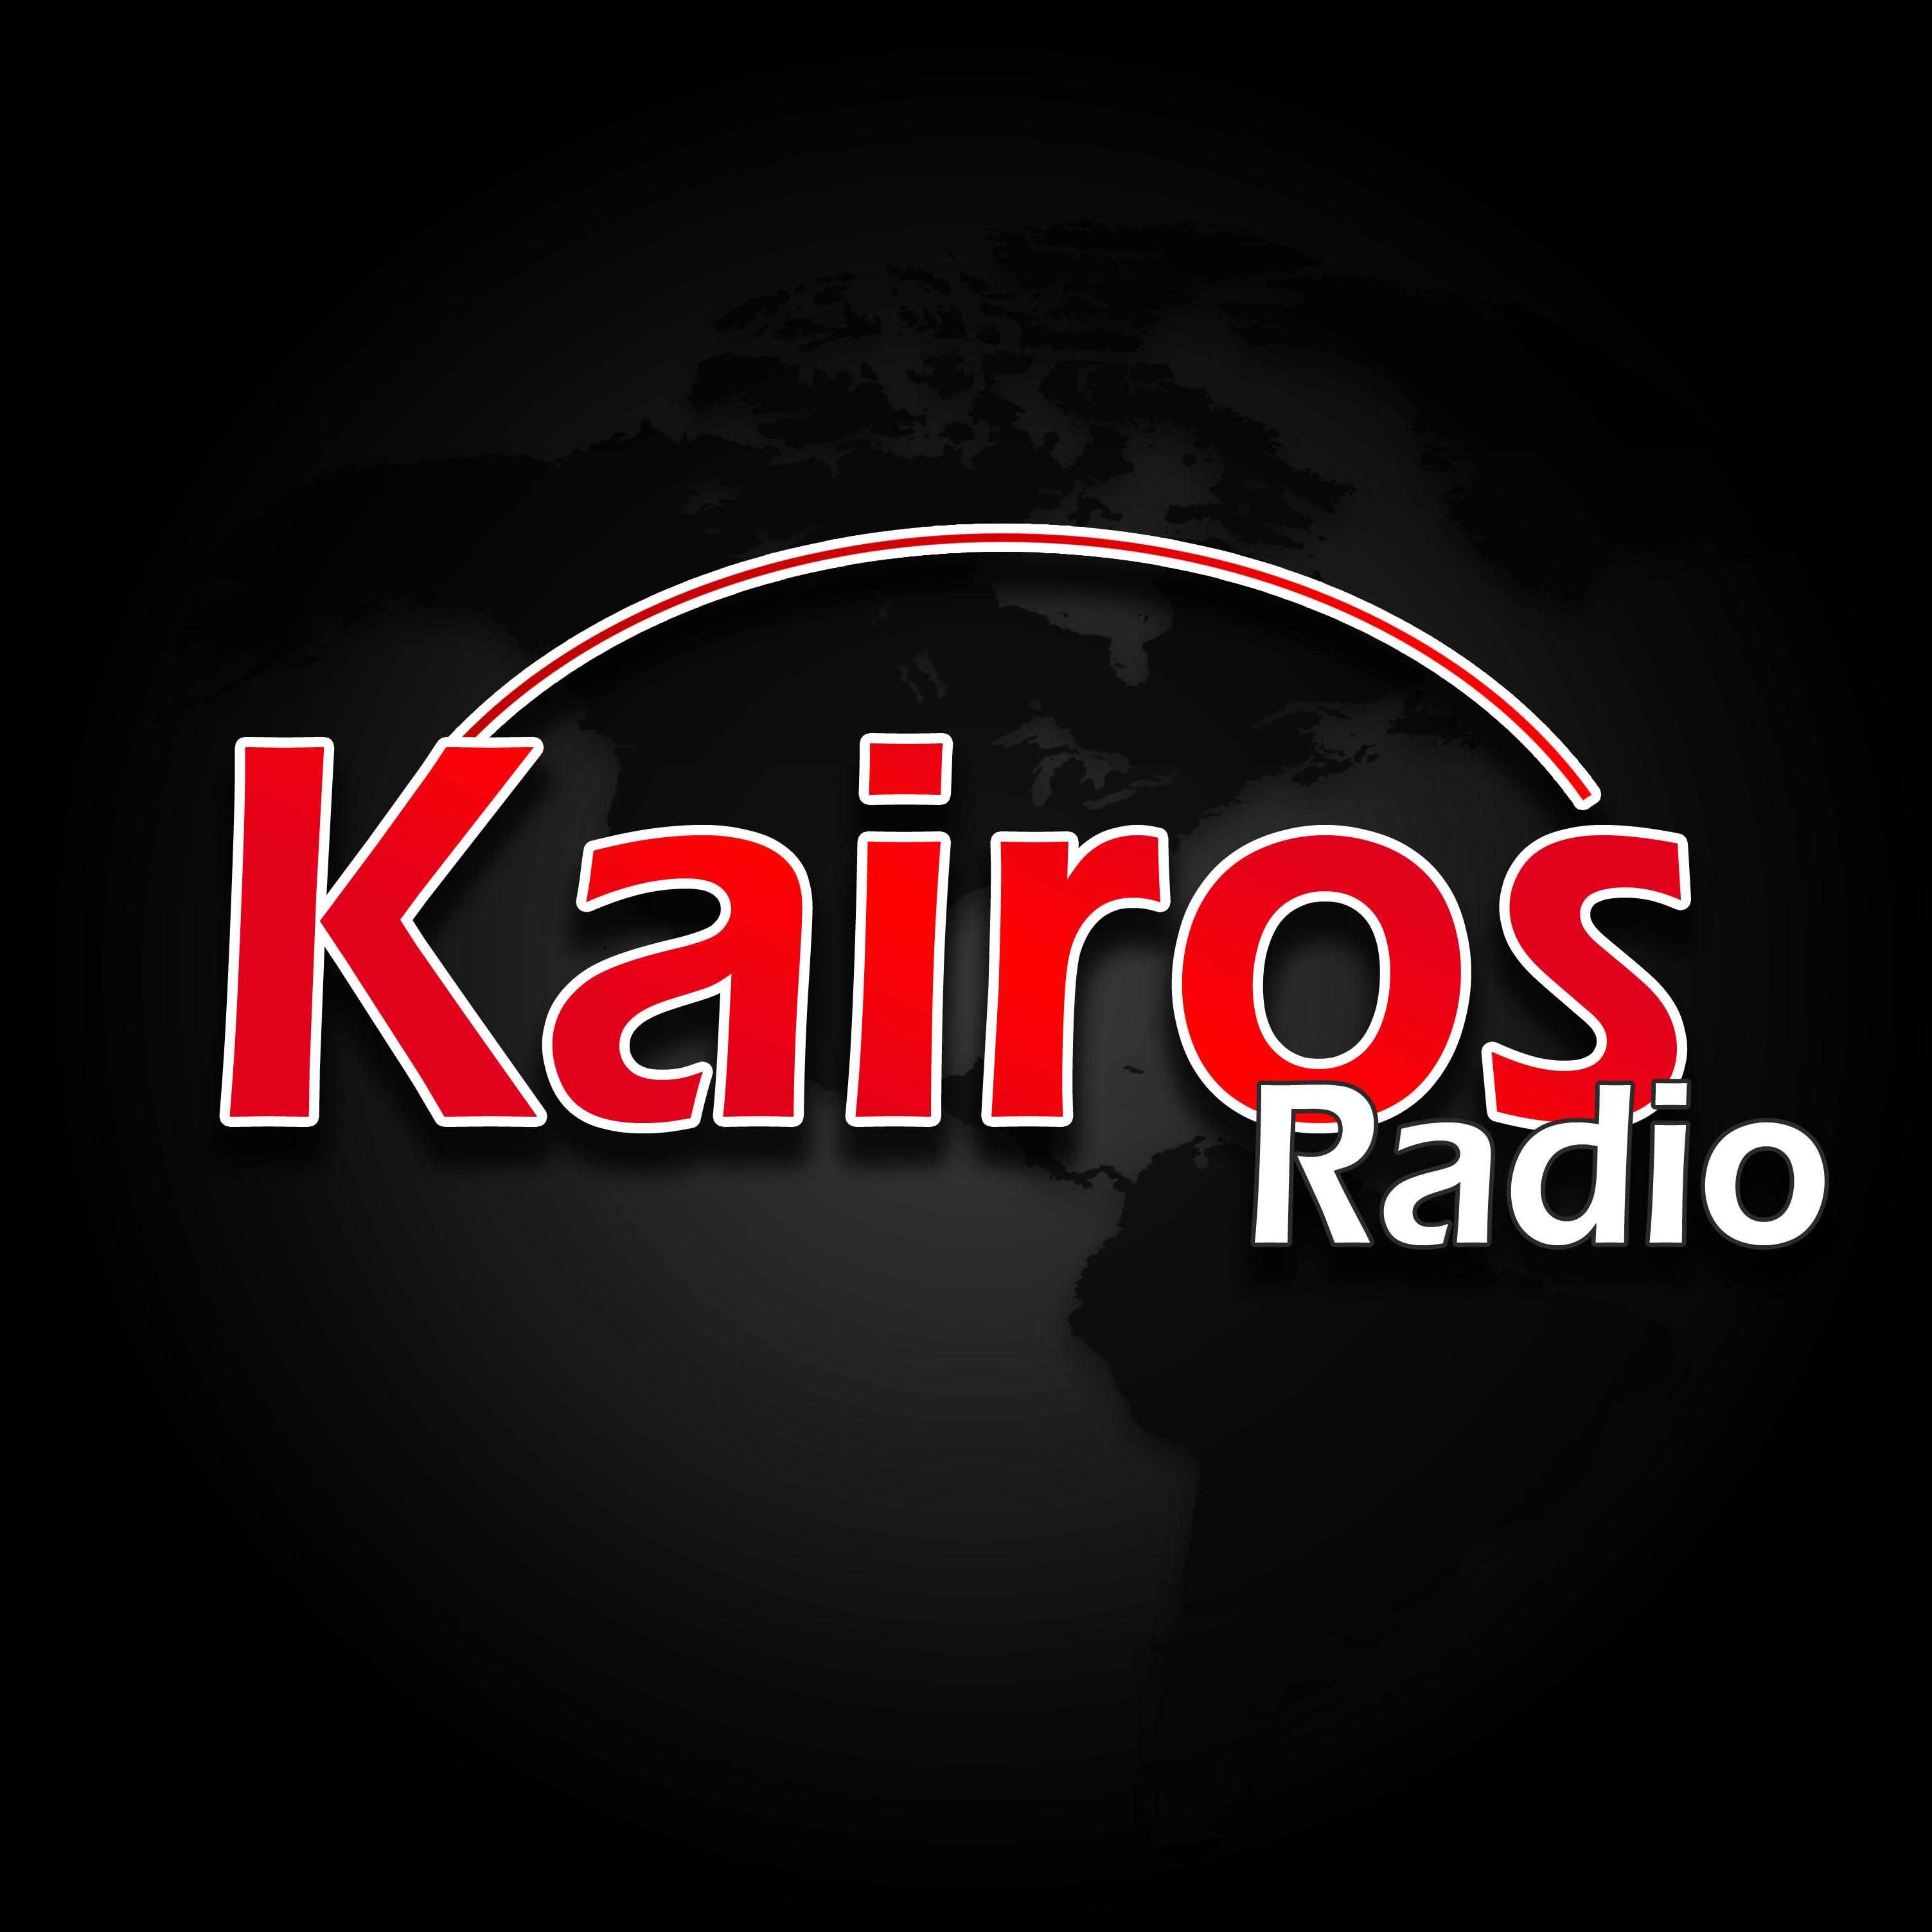 Kairos Radio Dallas